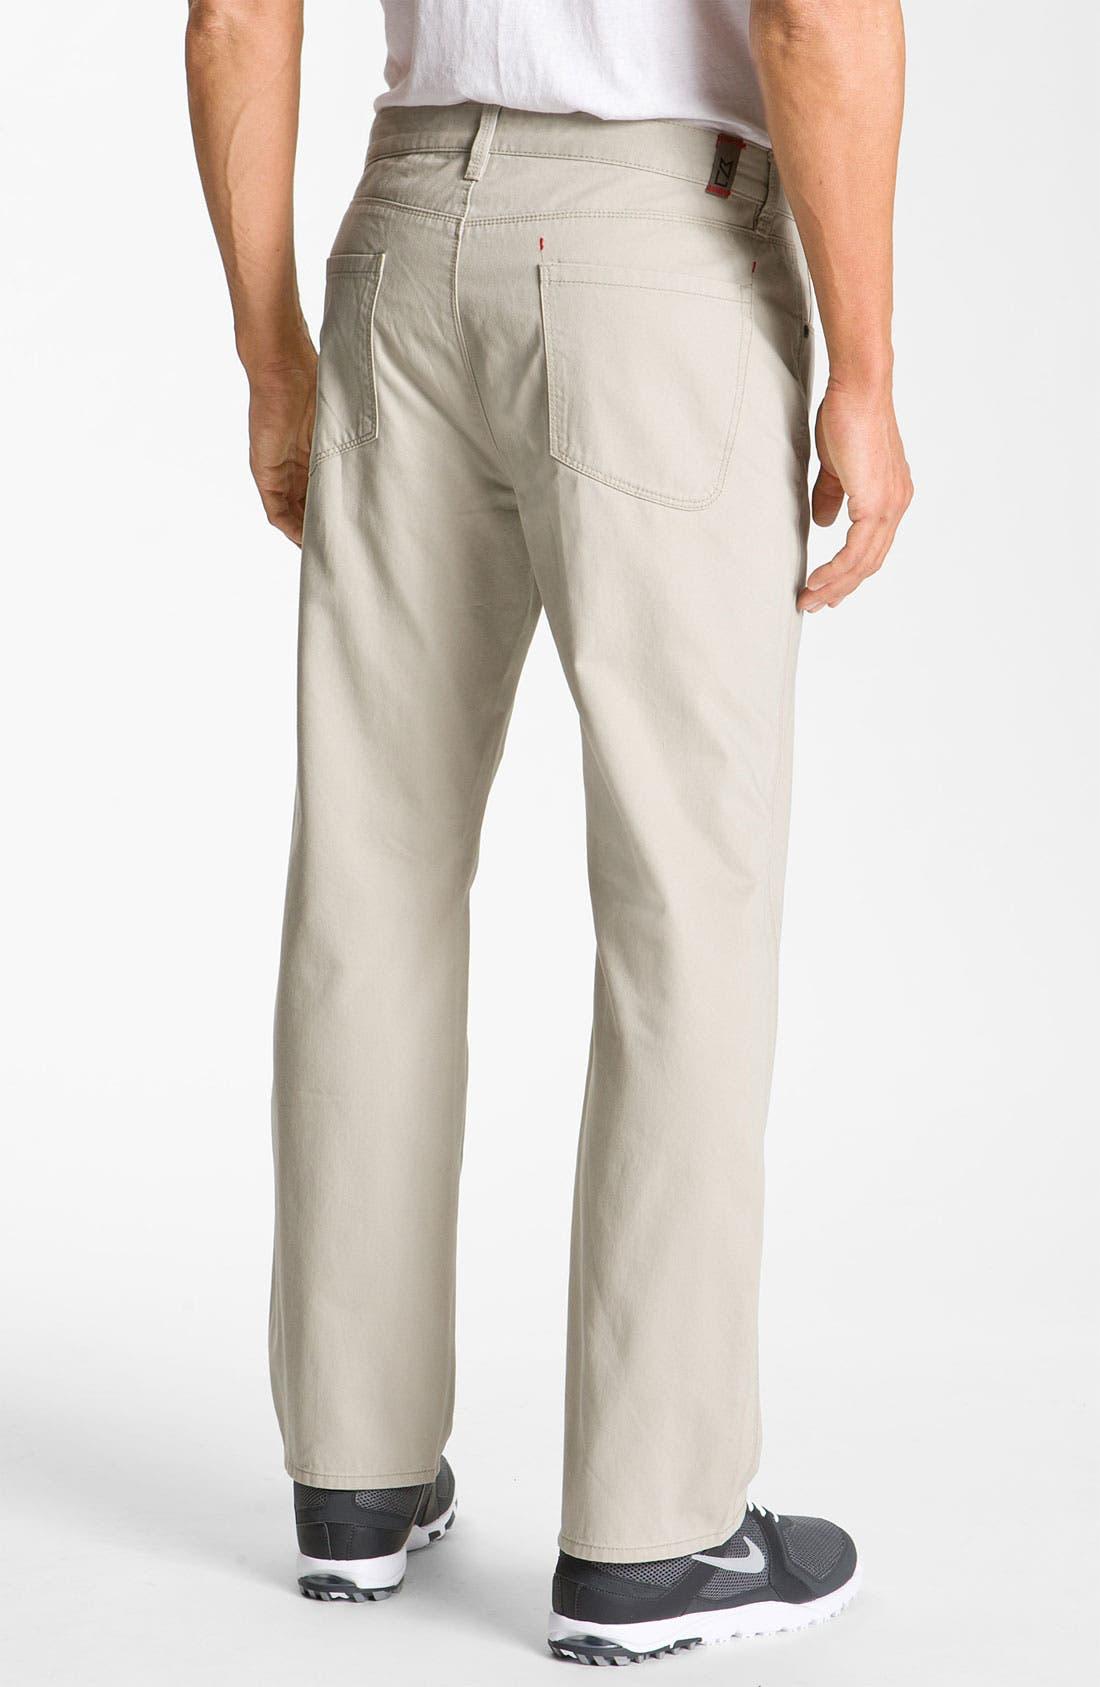 Alternate Image 2  - Cutter & Buck 'Pike' Five-Pocket Pants (Big & Tall)